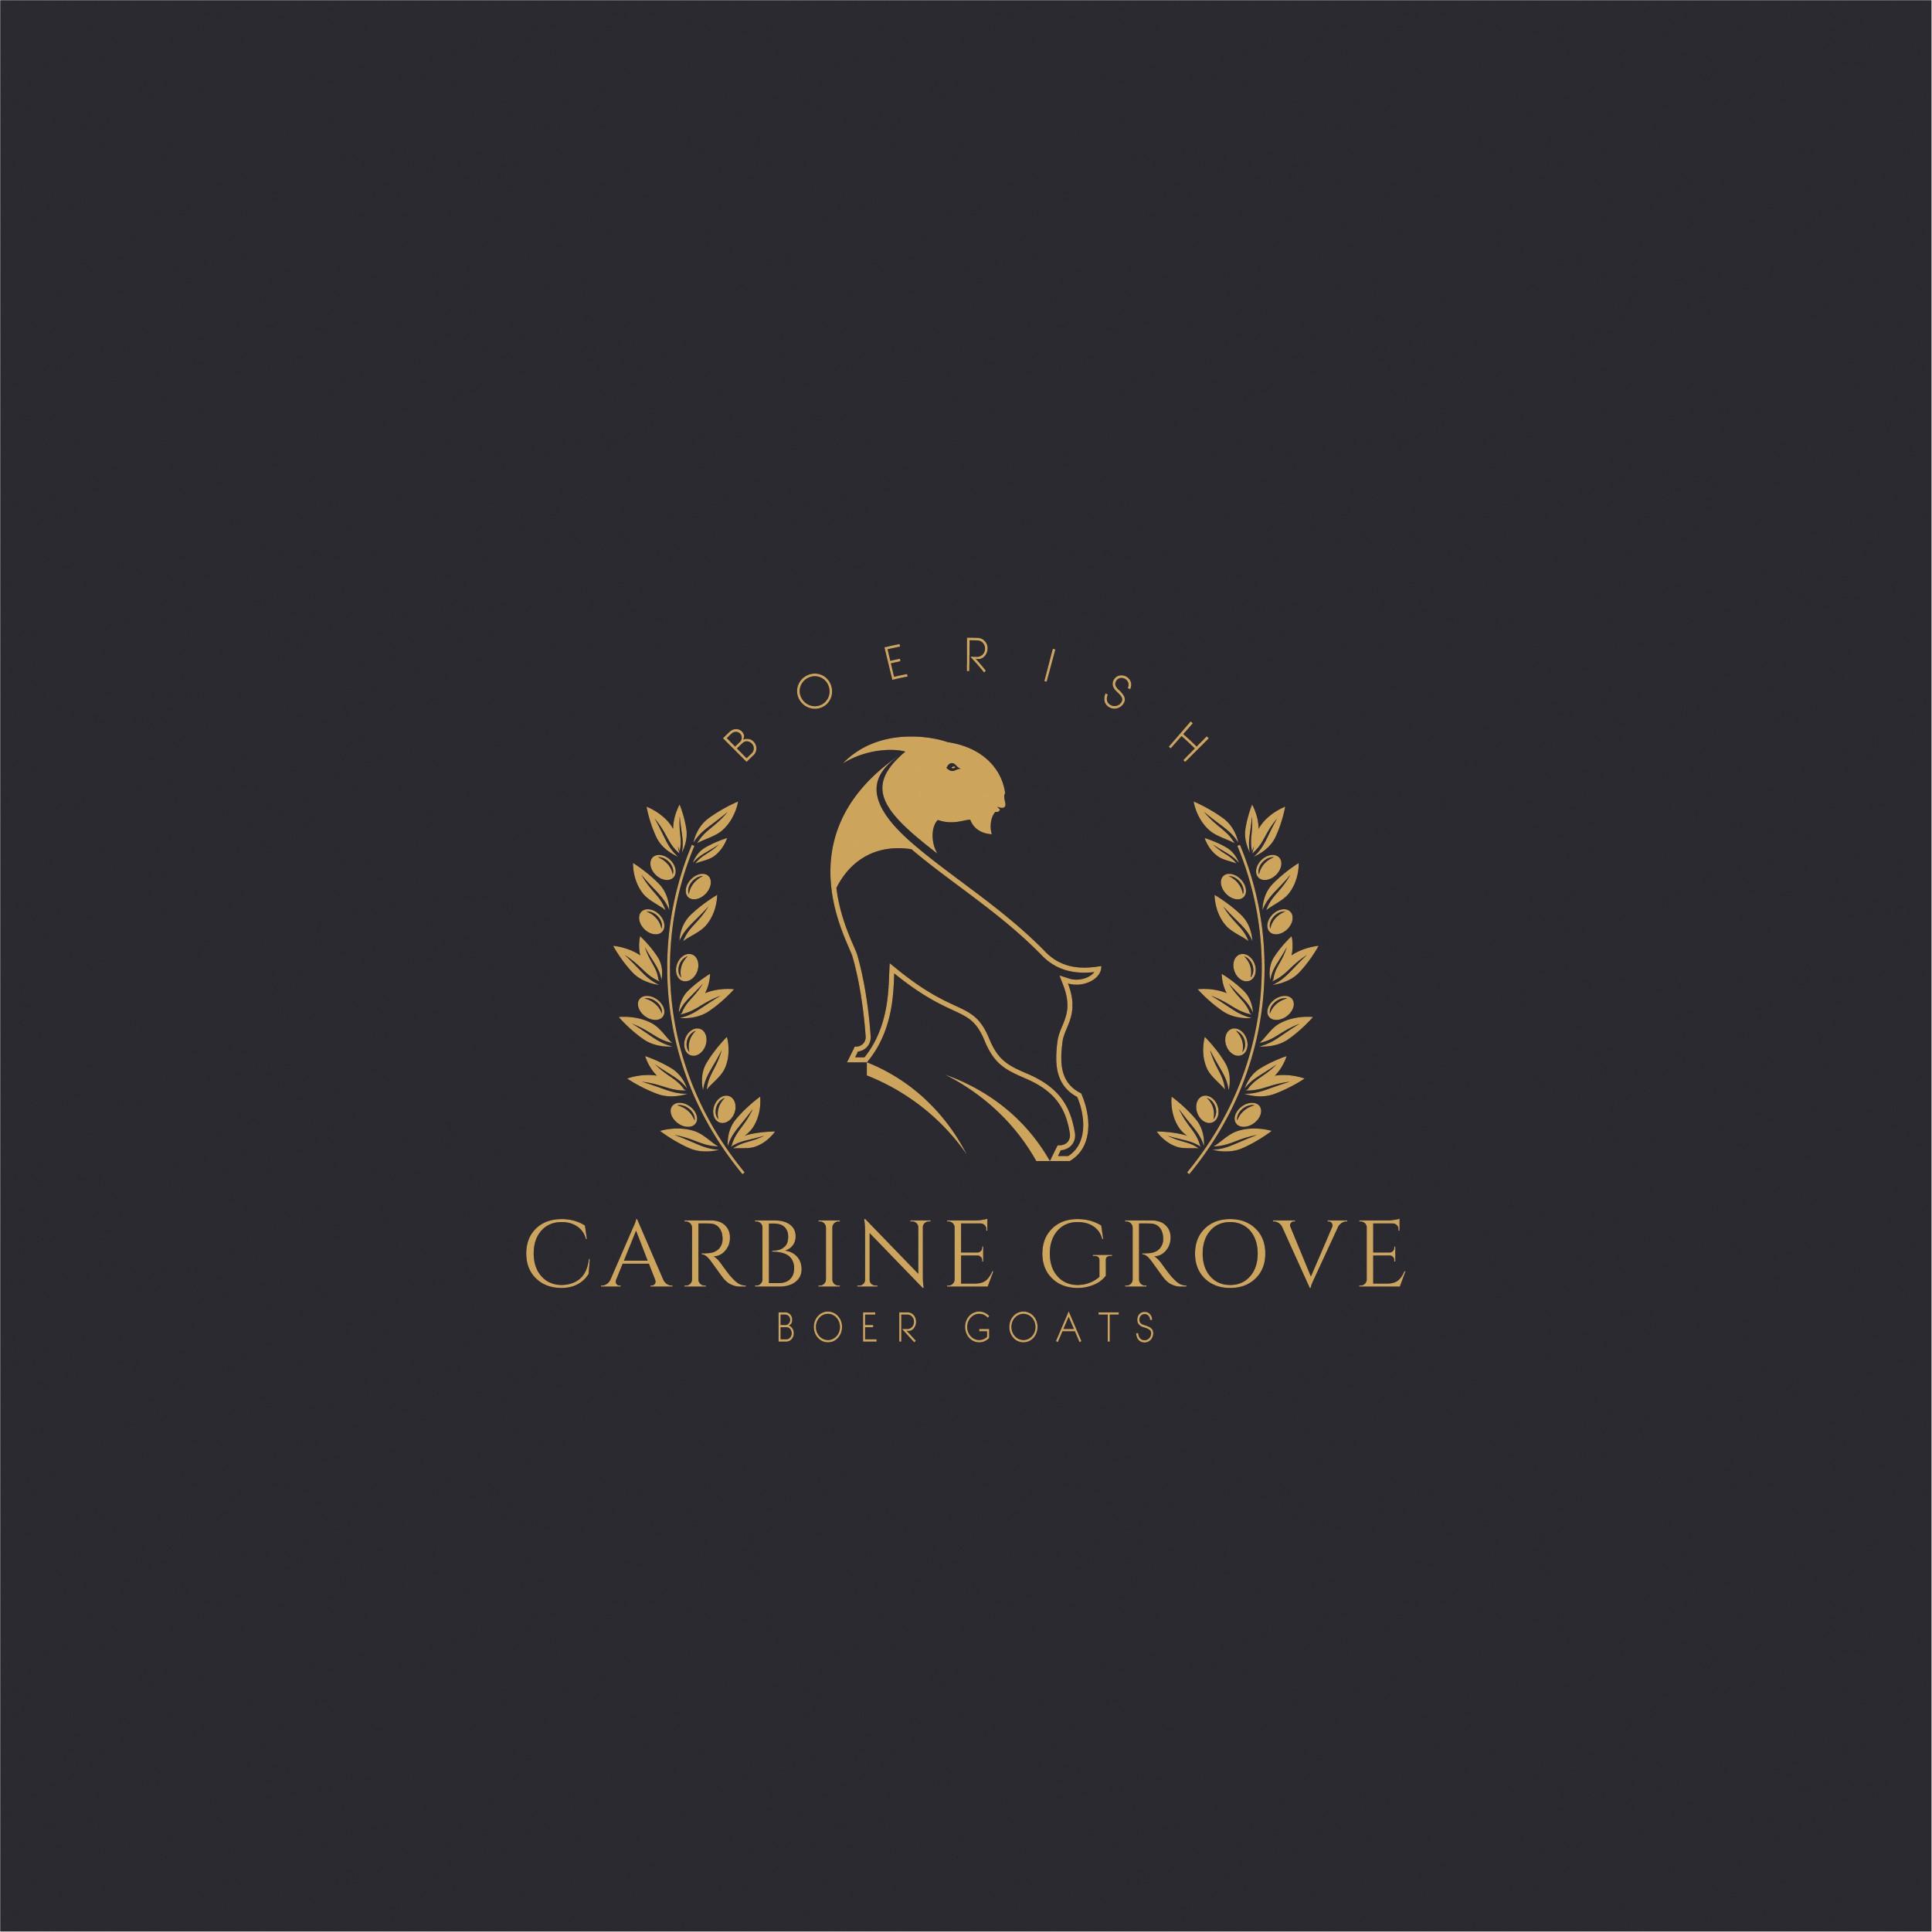 Carbine Grove Boer Goats needs a sophisticated logo for our gourmet goat farm.